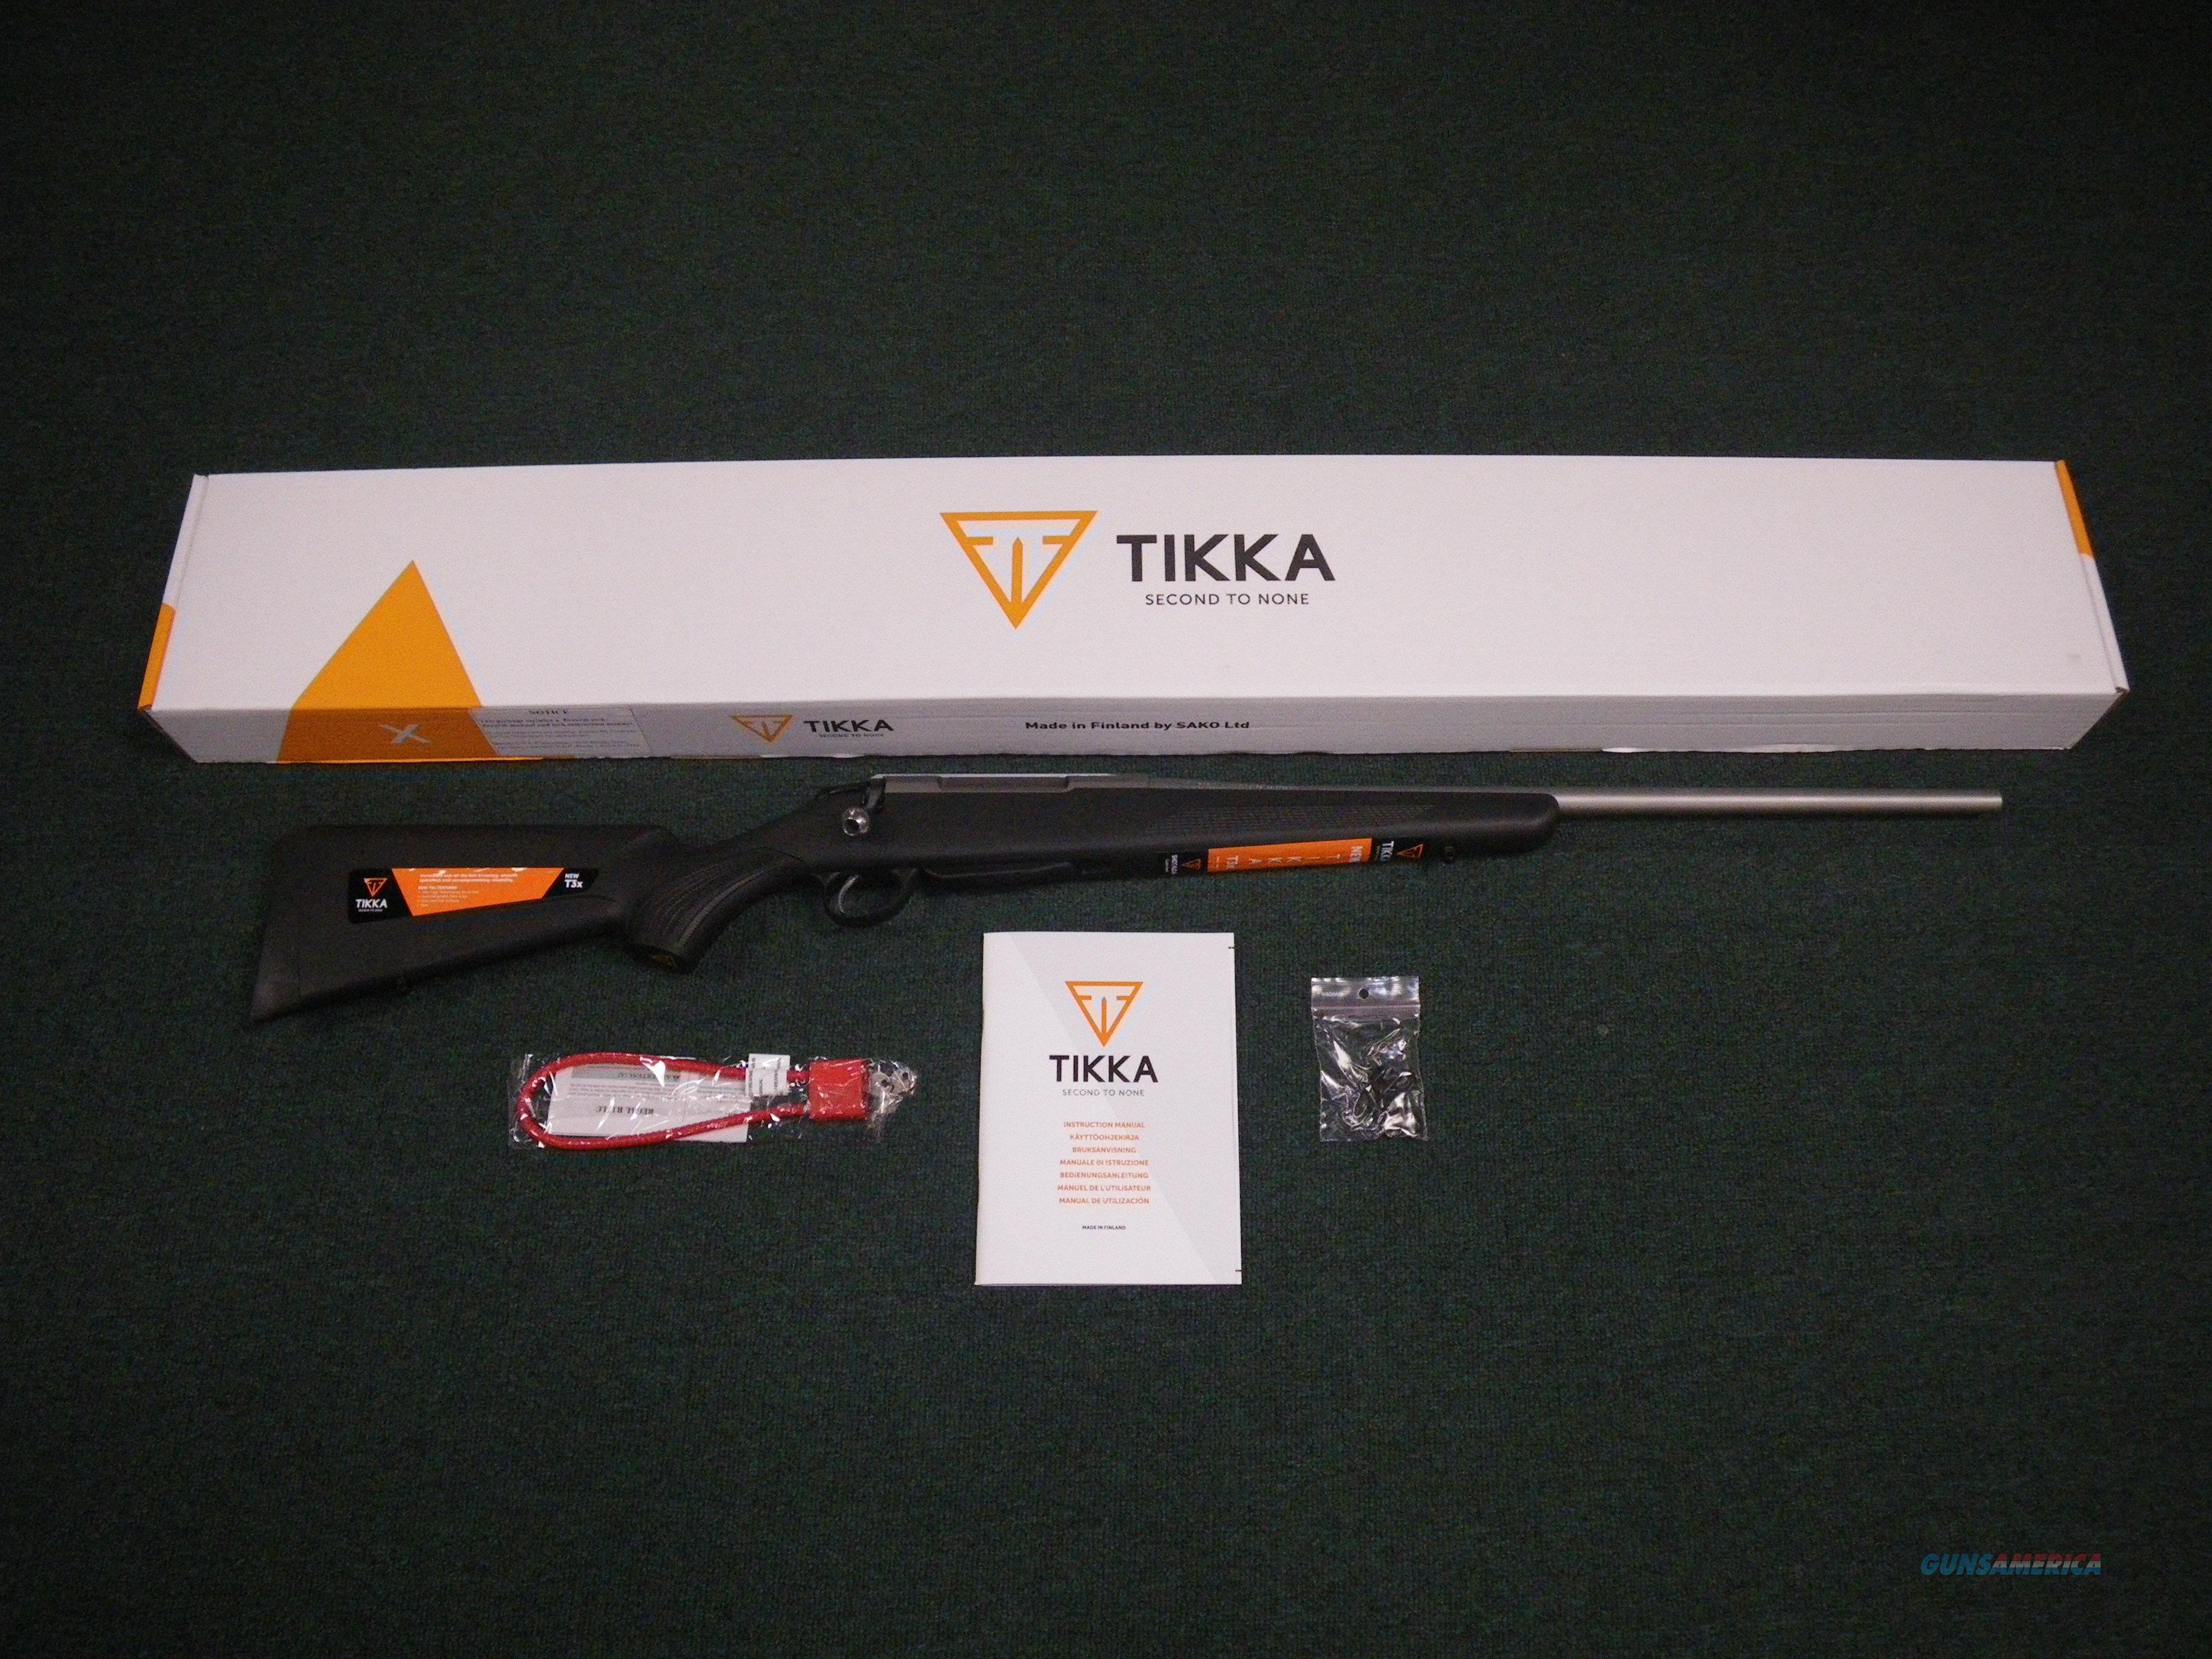 "Tikka T3x Lite Stainless/Synthetic 223 Rem 22.4"" NEW #JRTXB312  Guns > Rifles > Tikka Rifles > T3"